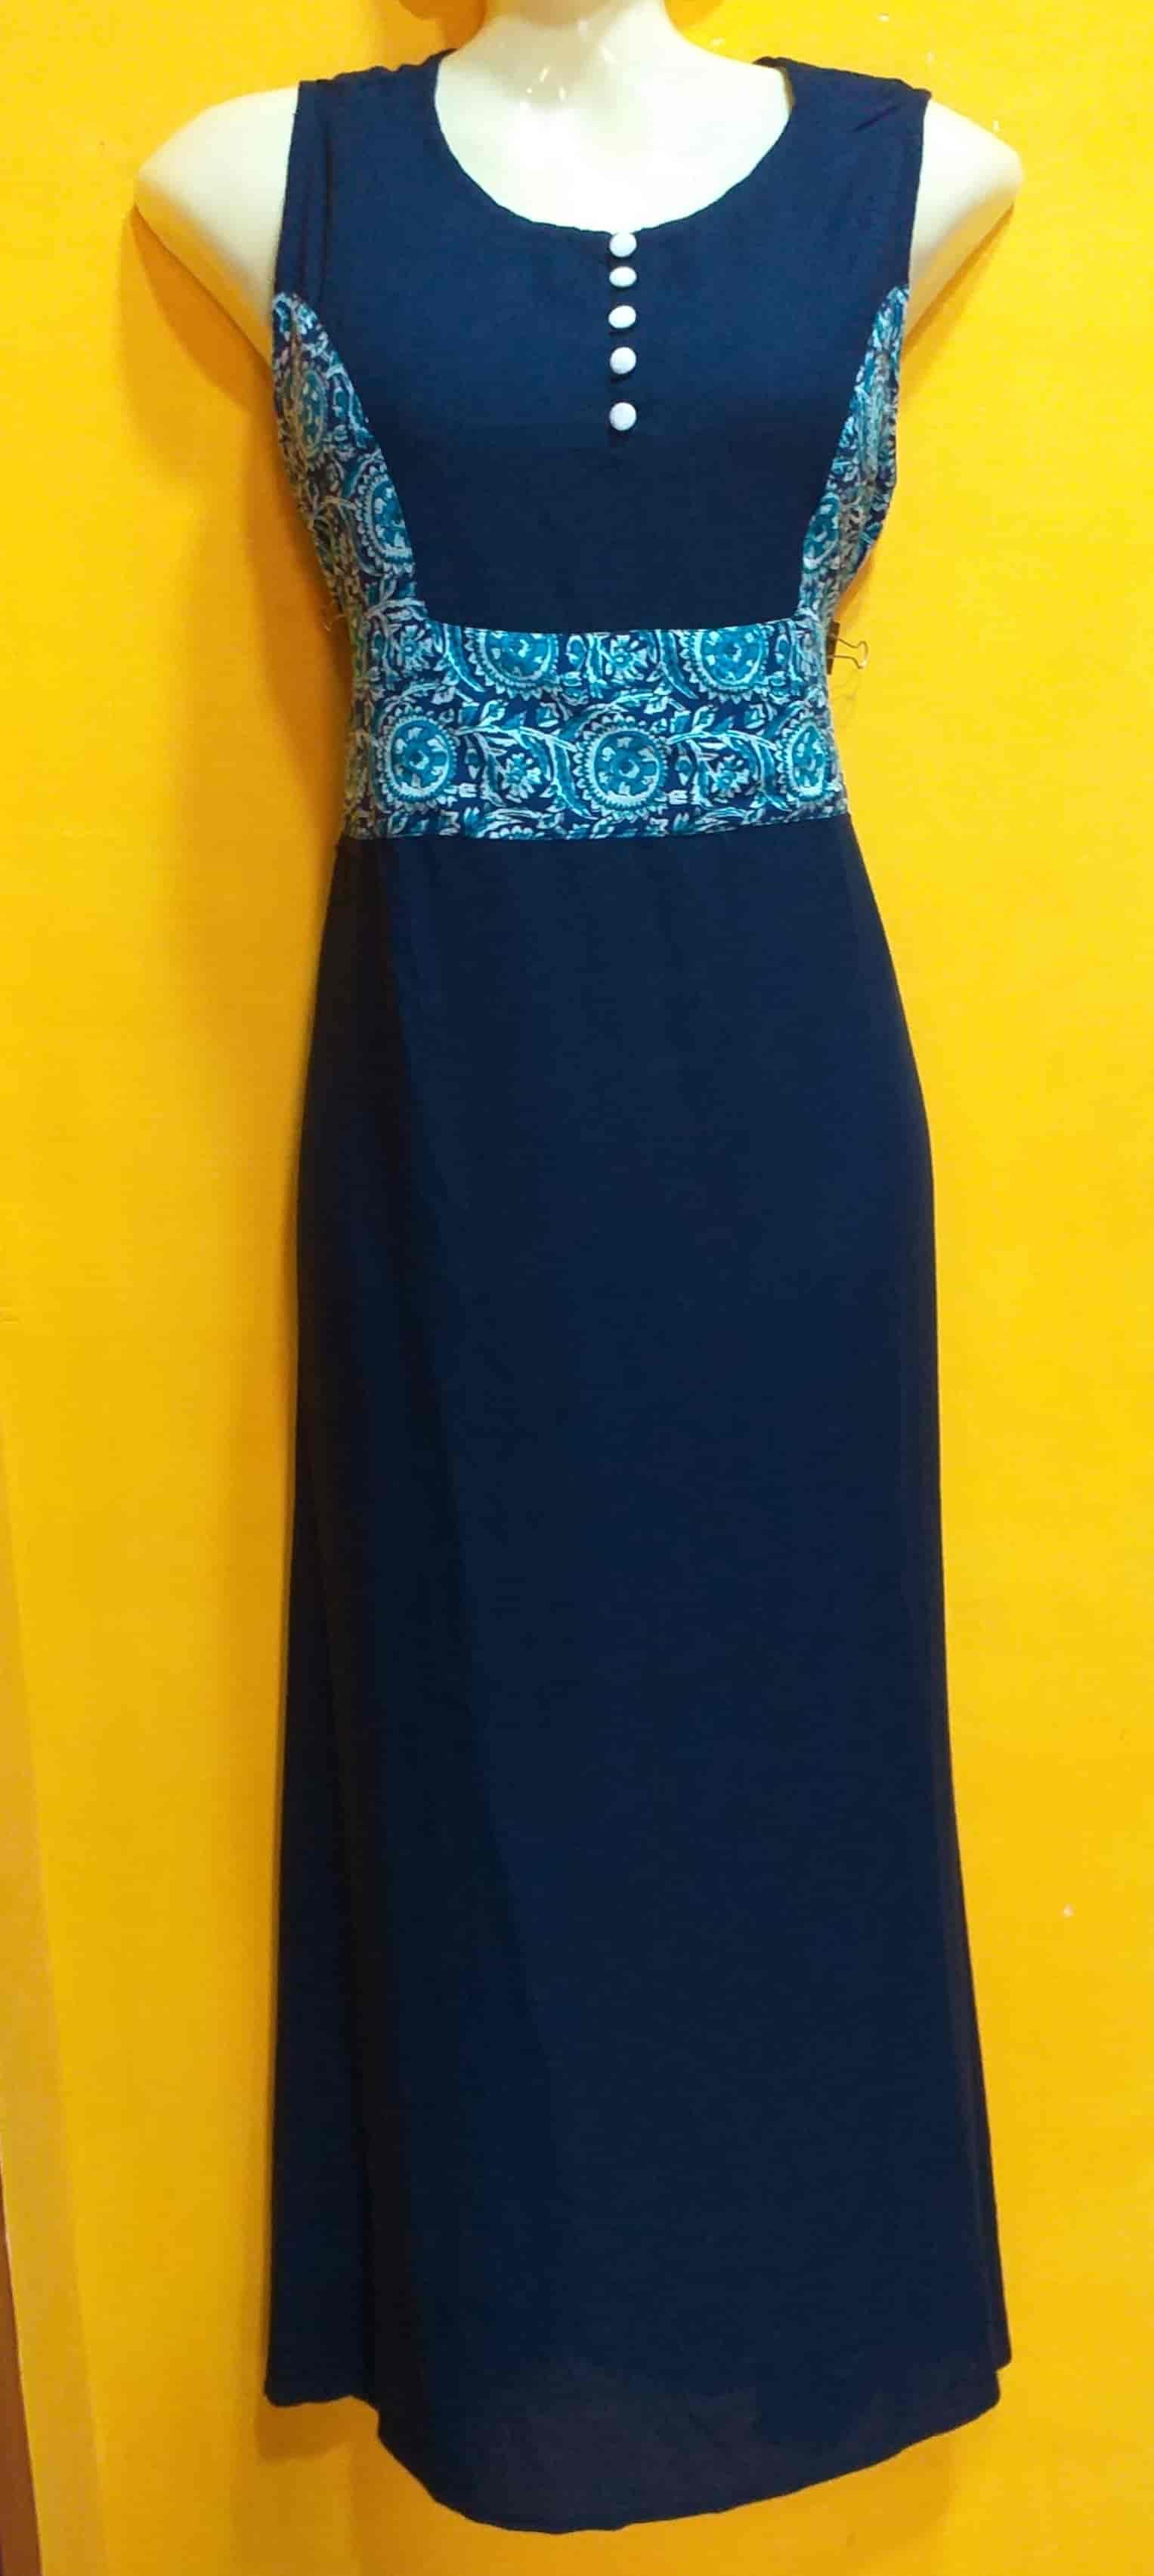 939af0d8d2 Monsoon Ladies Dresses Size 12 | Saddha